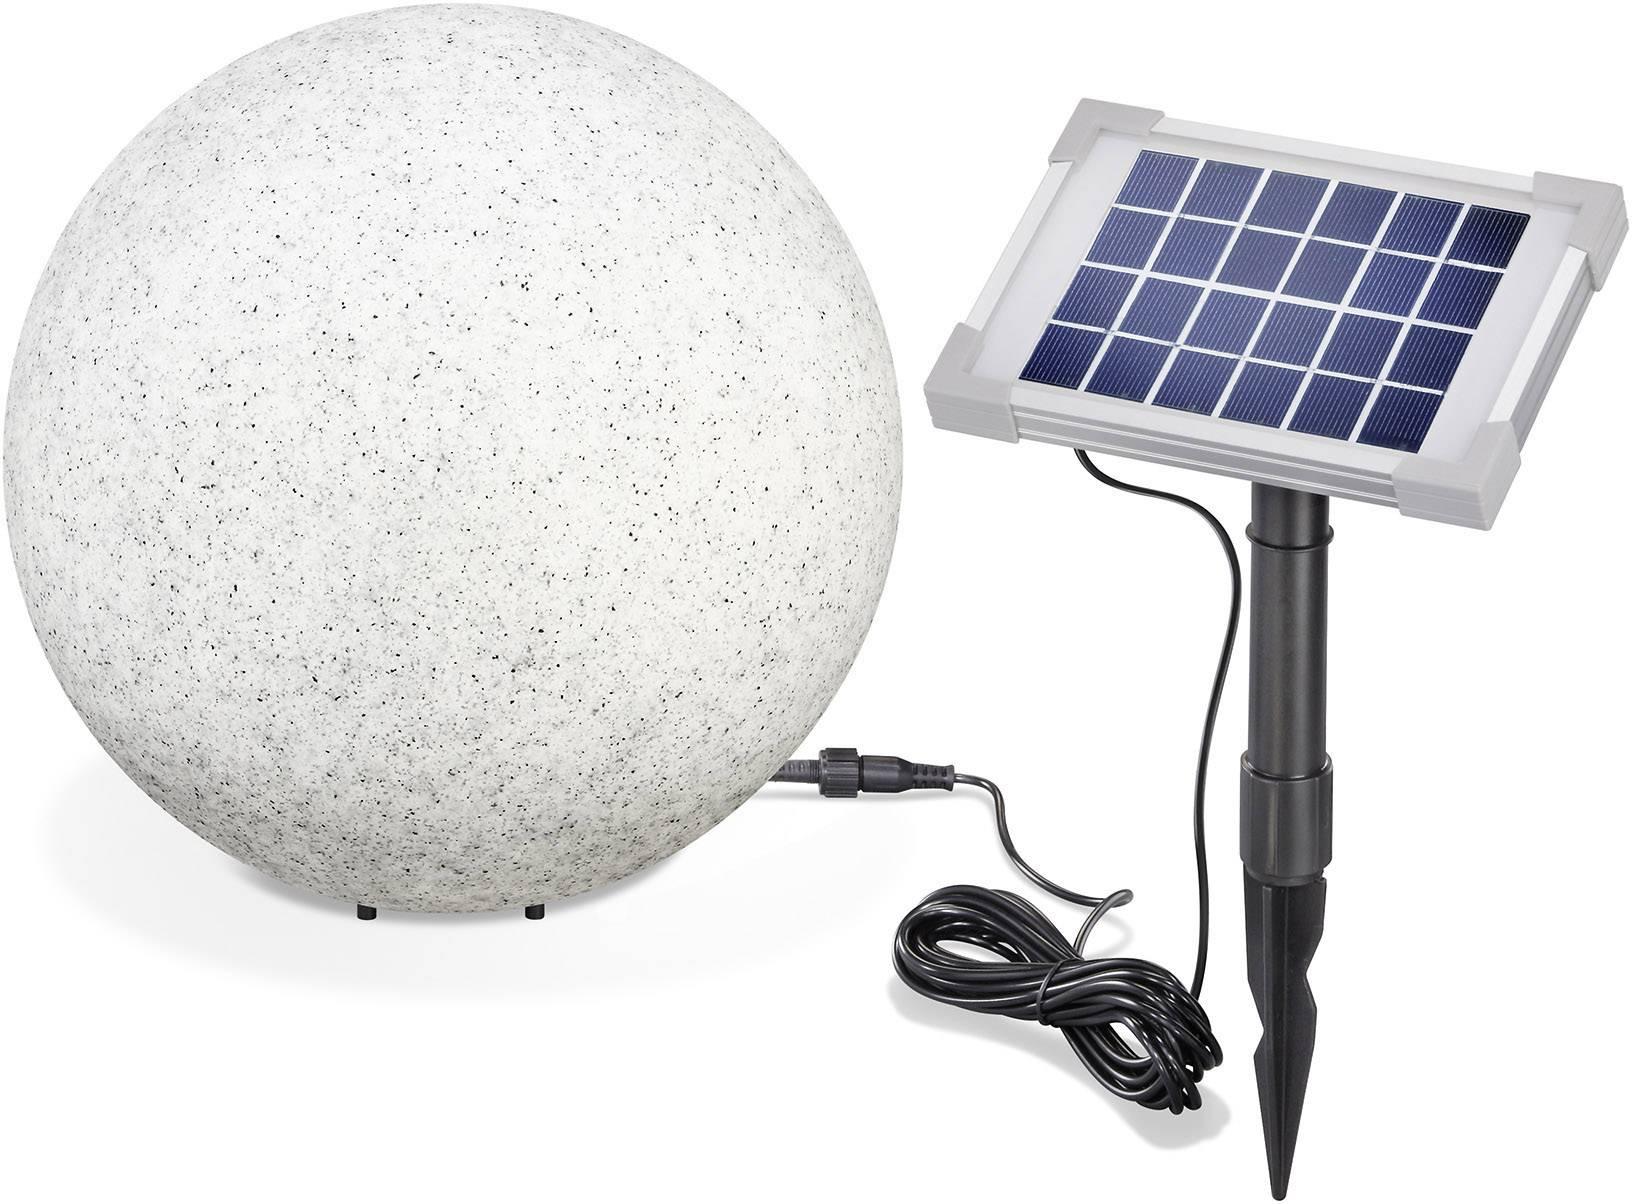 LED solárne dekoračné osvetlenie kameň Esotec Mega Stone 30 106020, IP65, sivá, RGB